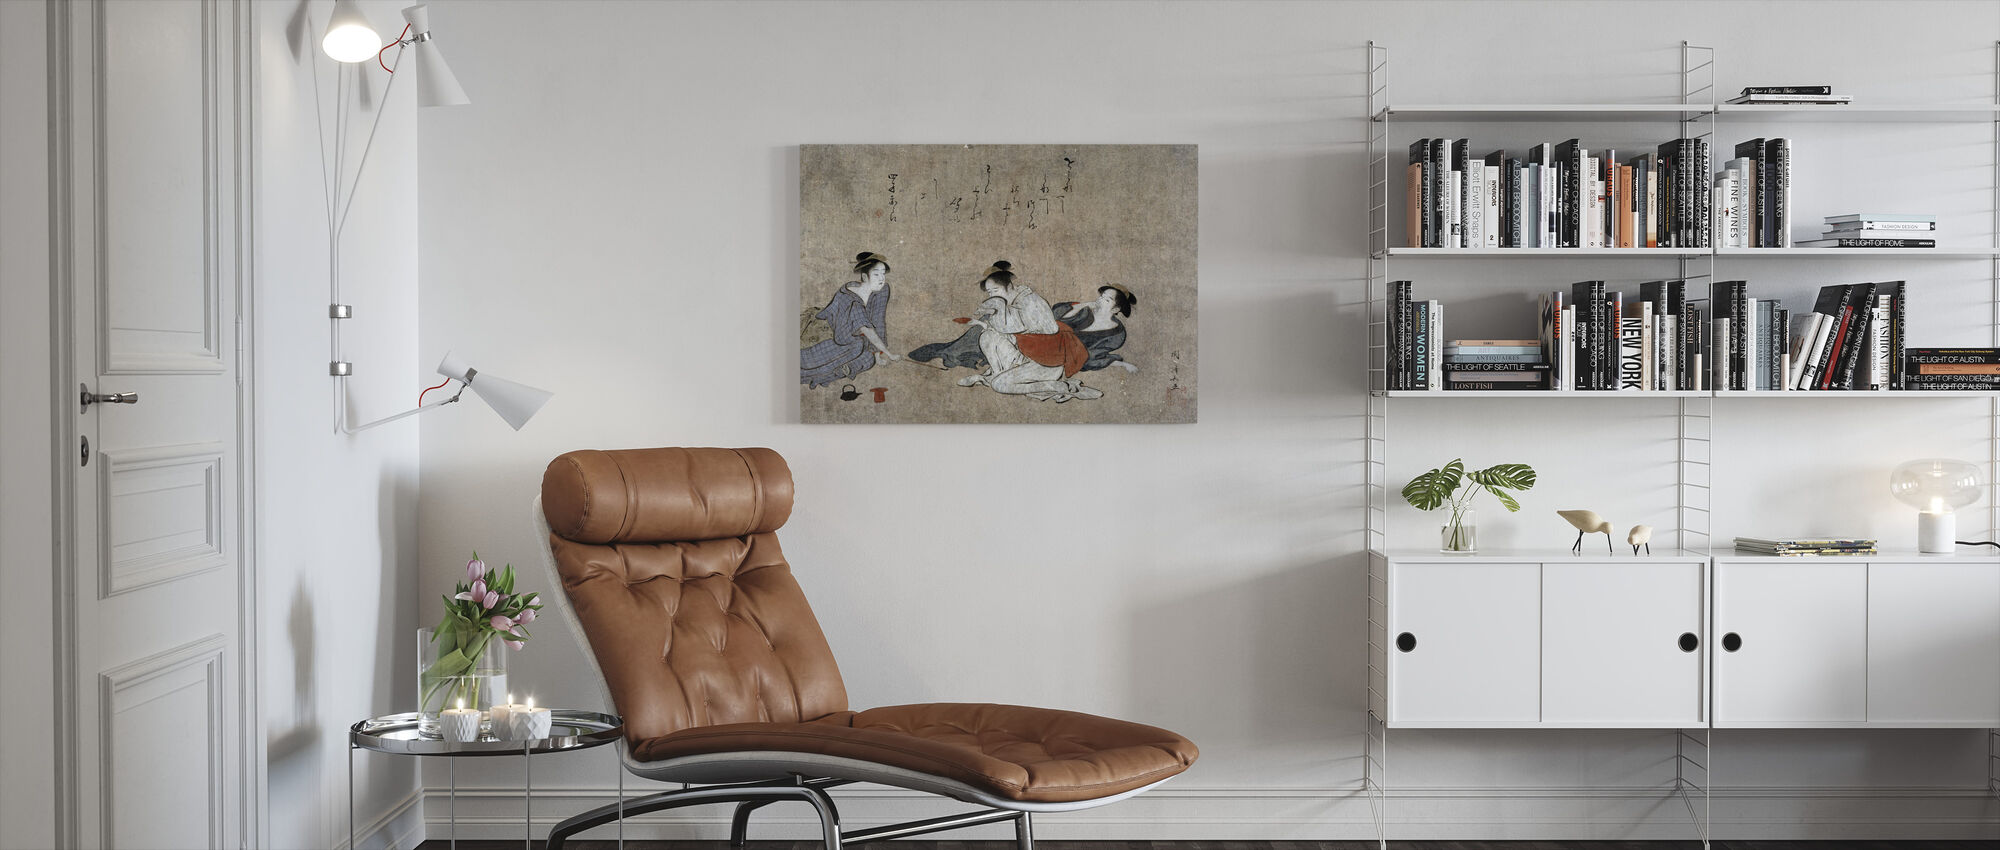 Three Drunken Women - Torii Kuyonobu - Canvas print - Living Room